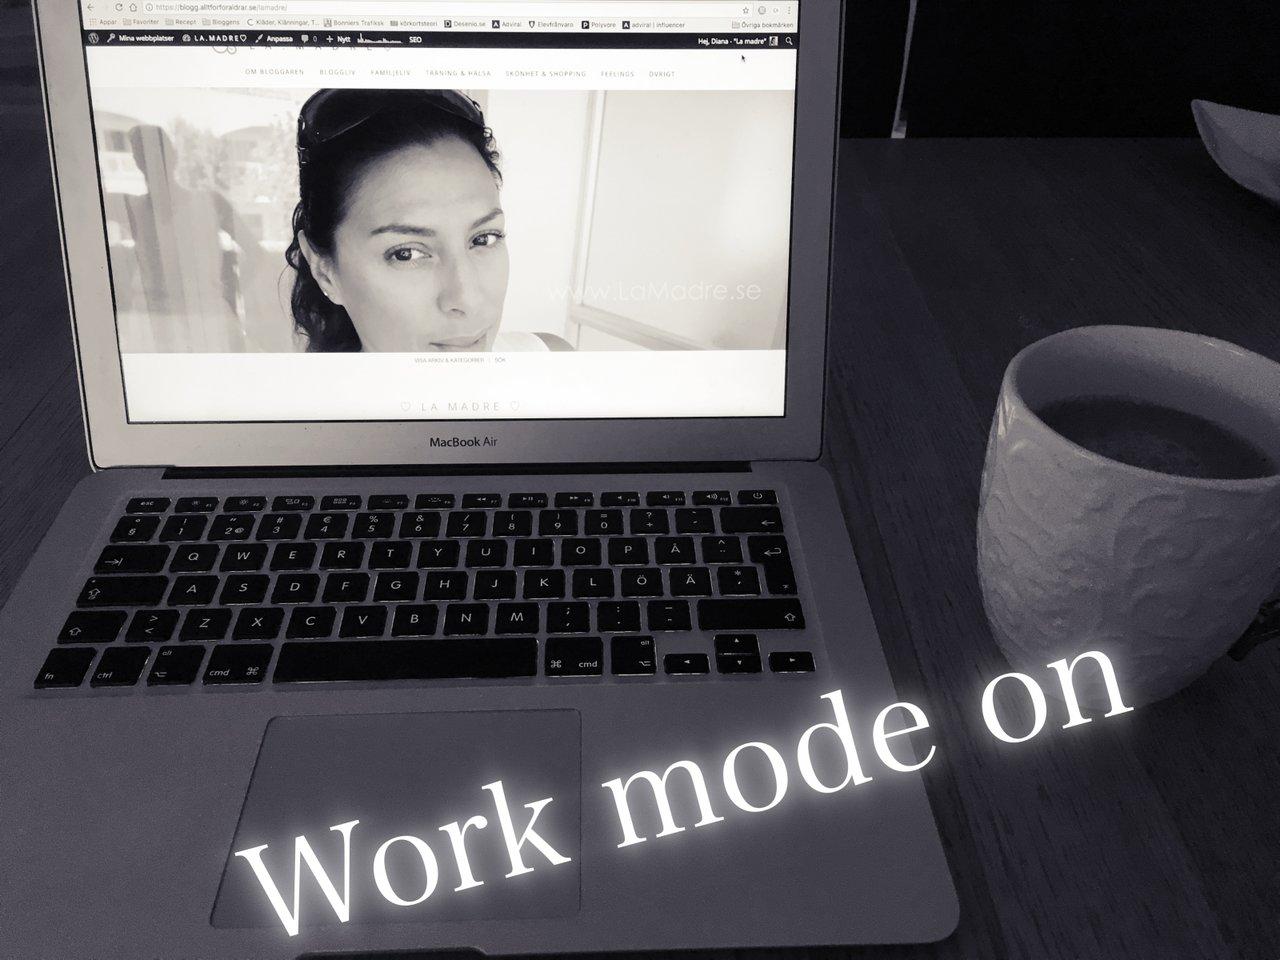 work_arbete_kontoret_blogg_bloggare_Influencer